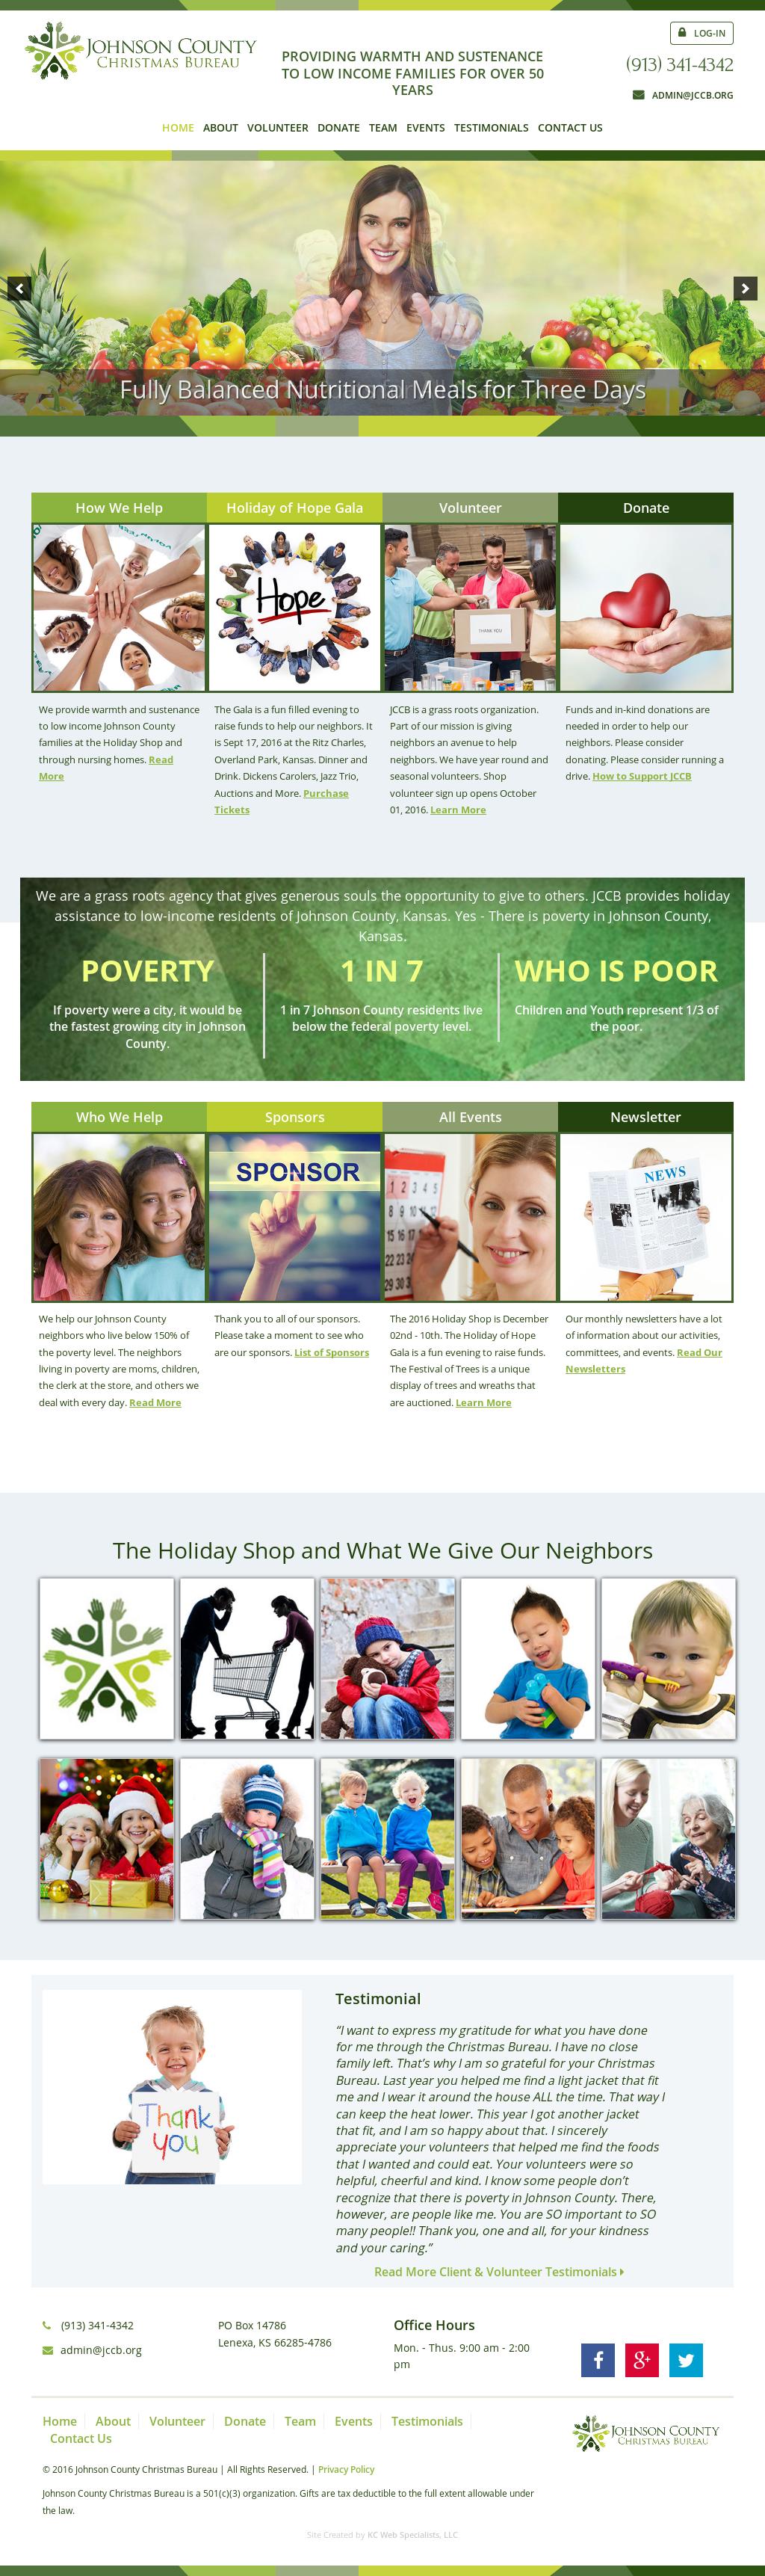 Johnson County Christmas Bureau Competitors, Revenue and Employees ...